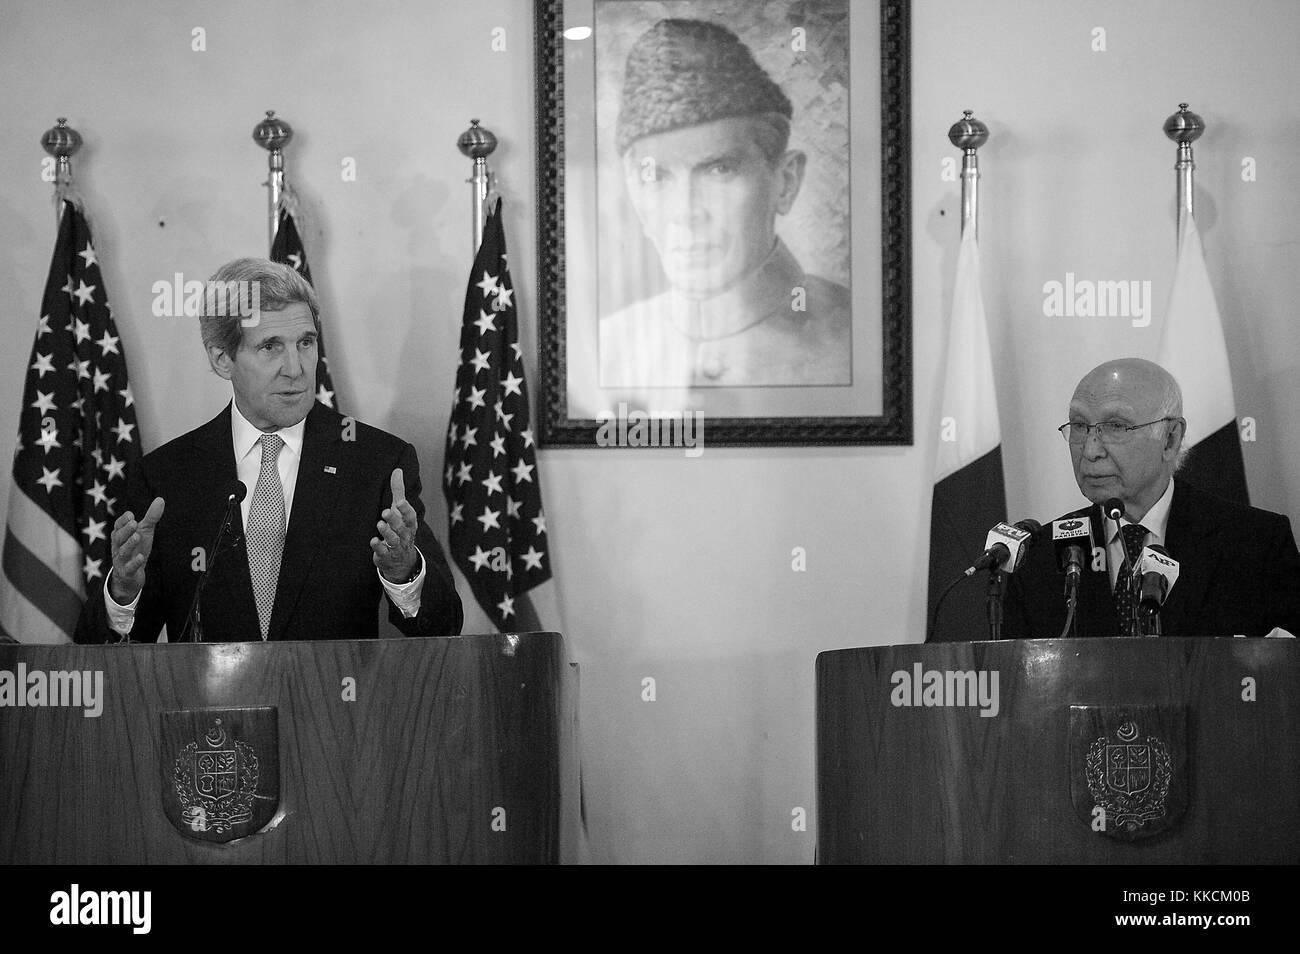 US Secretary of State John Kerry, joined by Pakistani National Security Adviser Sartaj Aziz and under a portrait - Stock Image